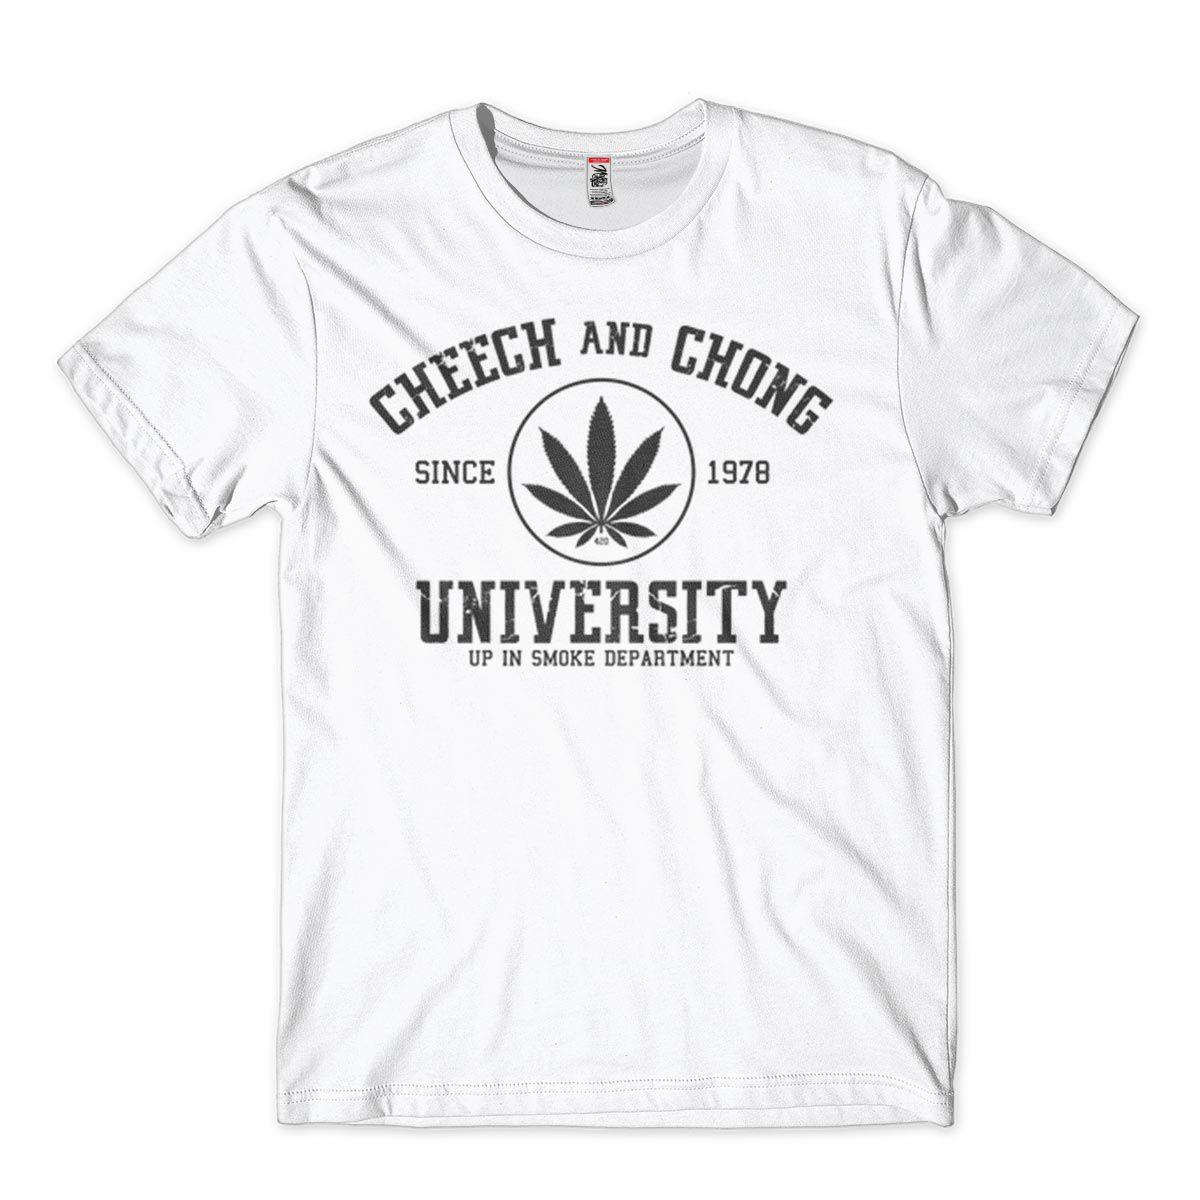 Camiseta Cheech And Chong Hippies Maconha Filme Humor